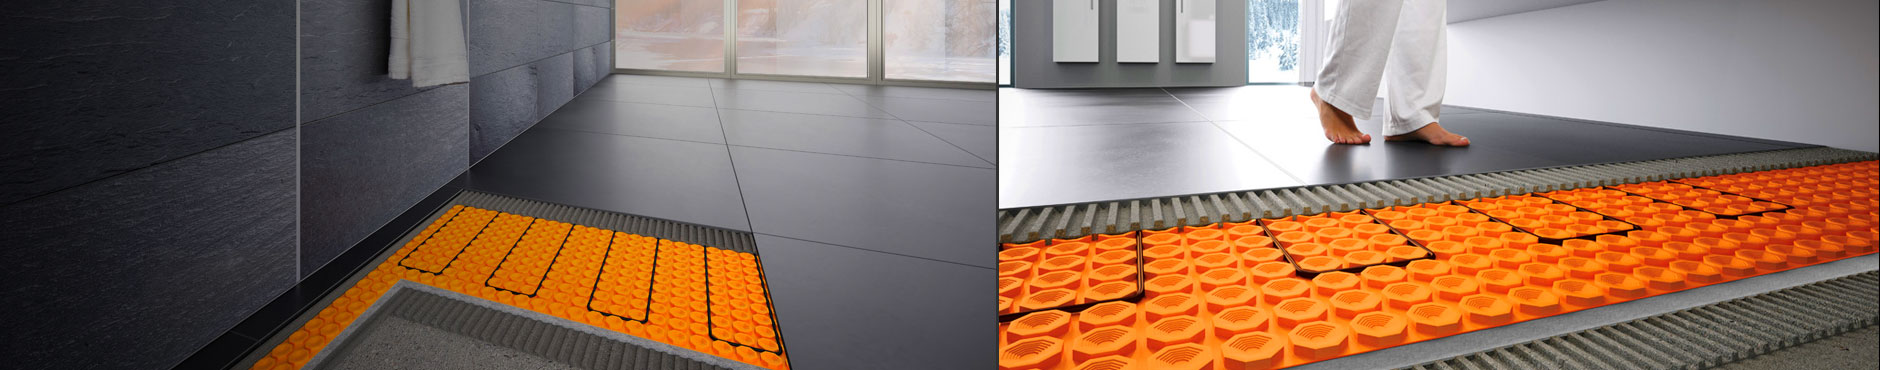 Schlüter-Systems Underfloor Heating